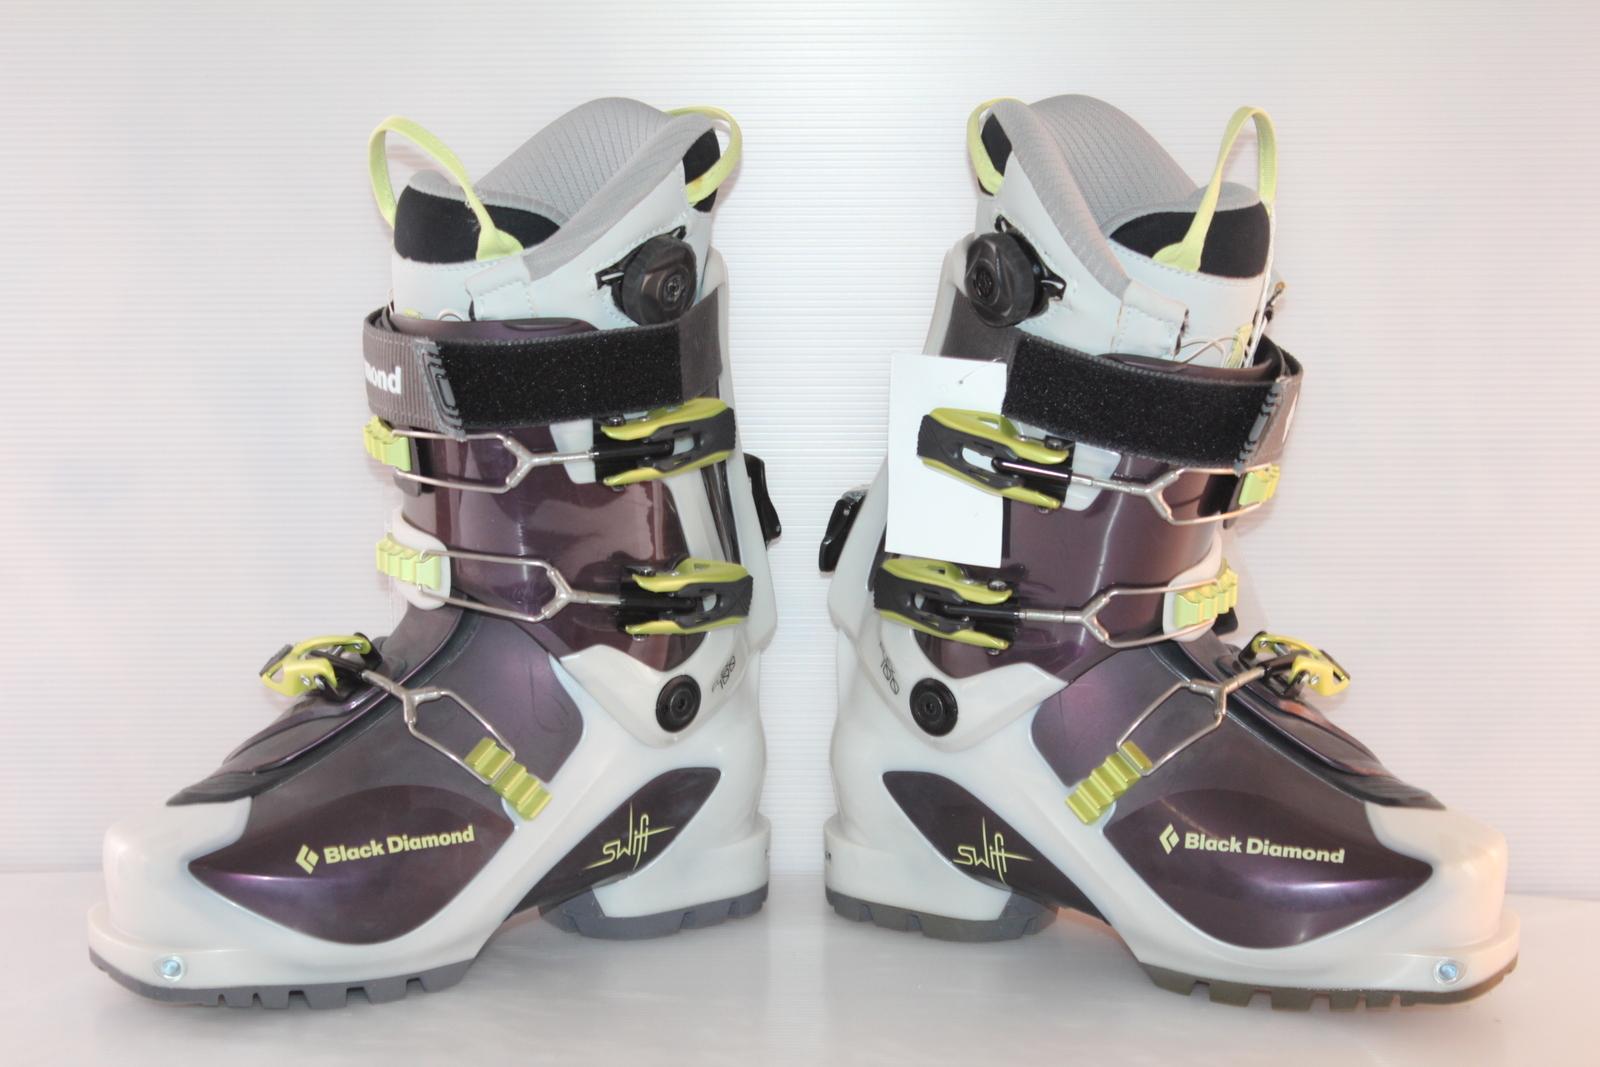 Skialpové boty Black Diamond SWIFT - skialp vel. EU38 flexe 100